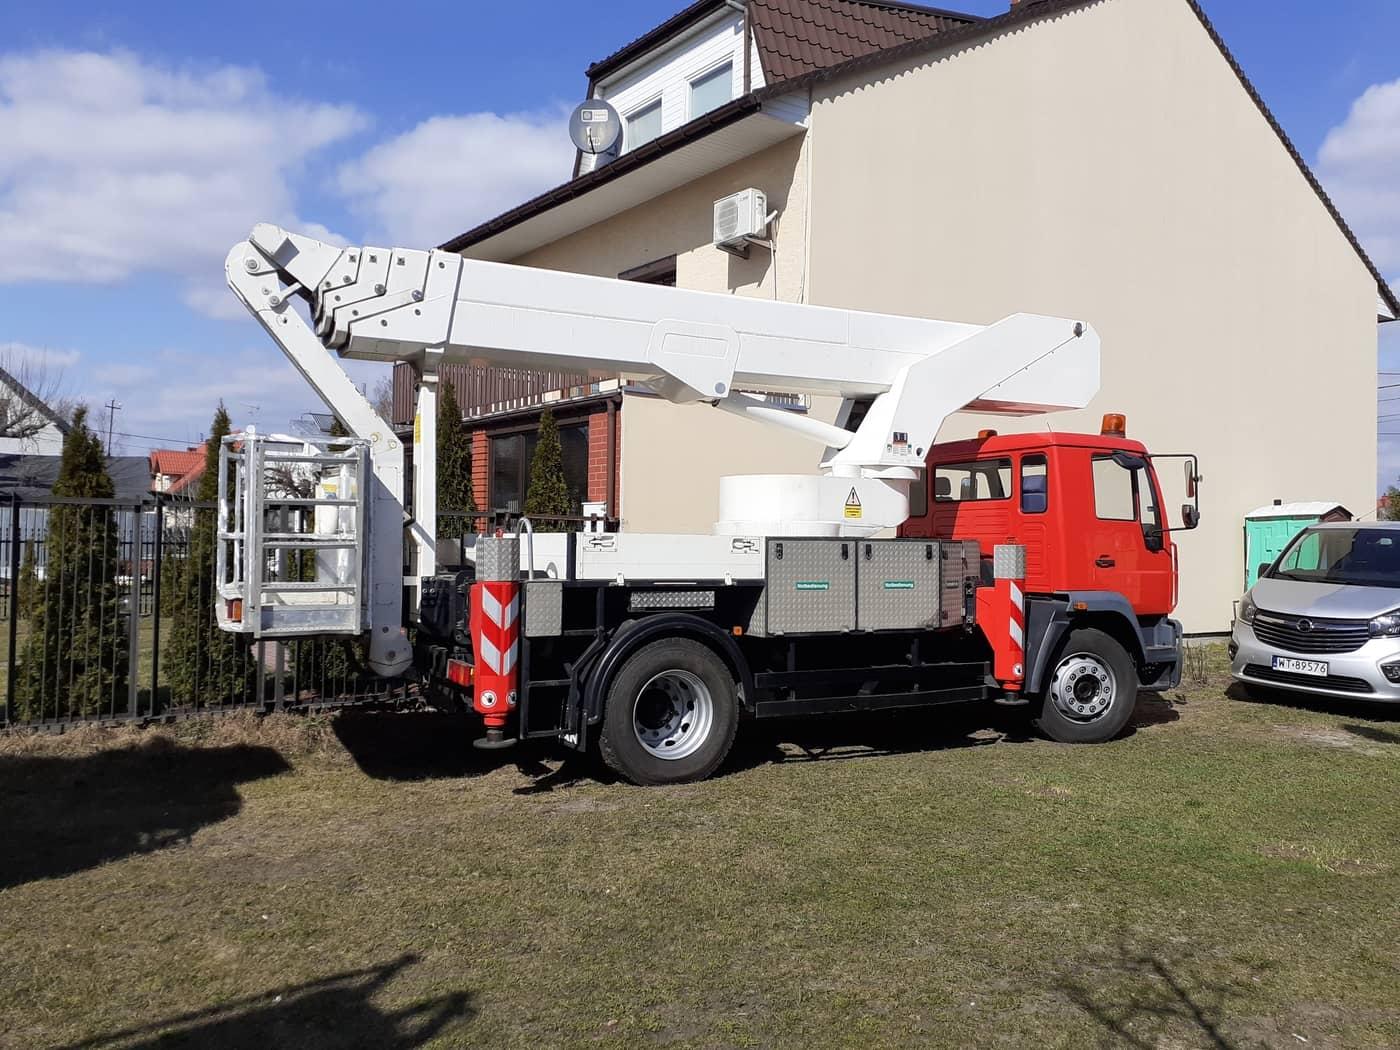 liftstar-podnosniki-koszowe-img04 (4)